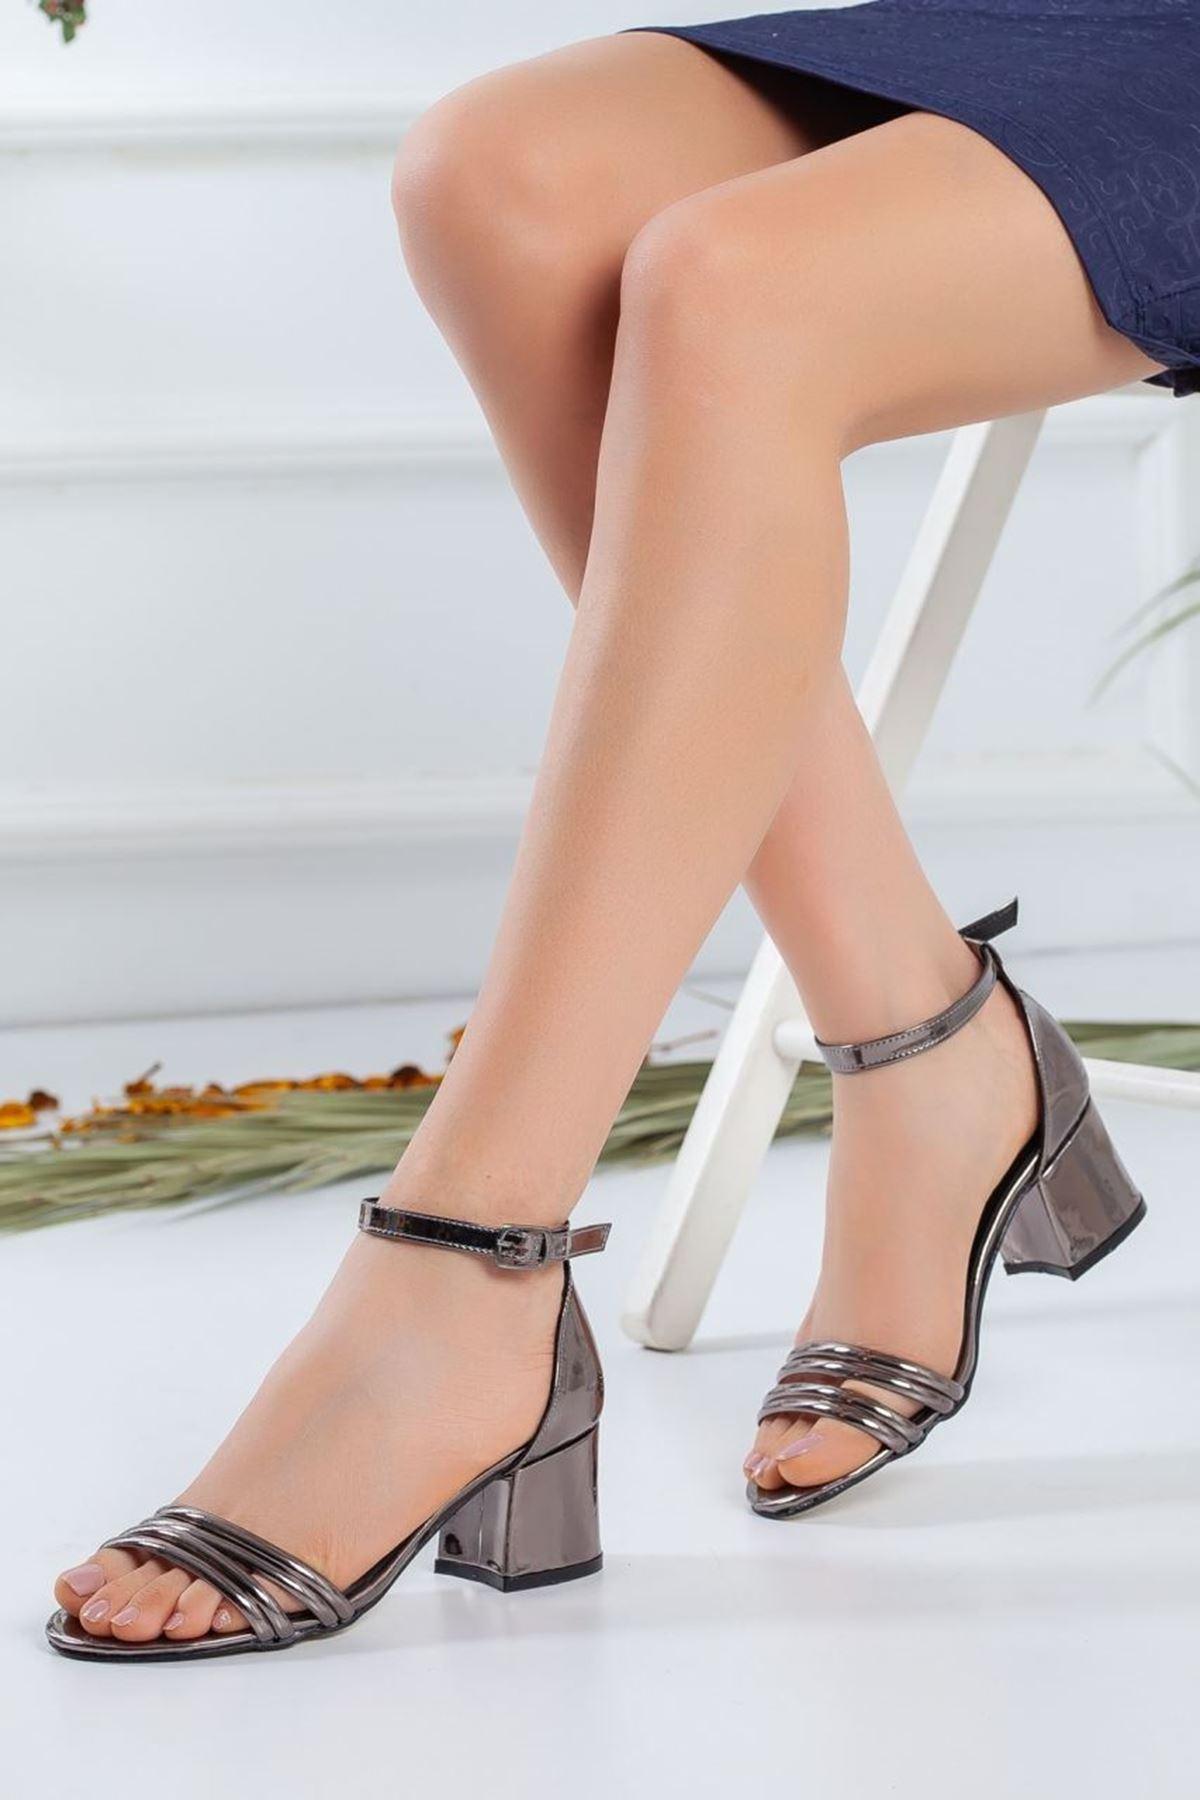 Kadın Natin Parlak Hafif Topuklu Ayakkabı  Platin